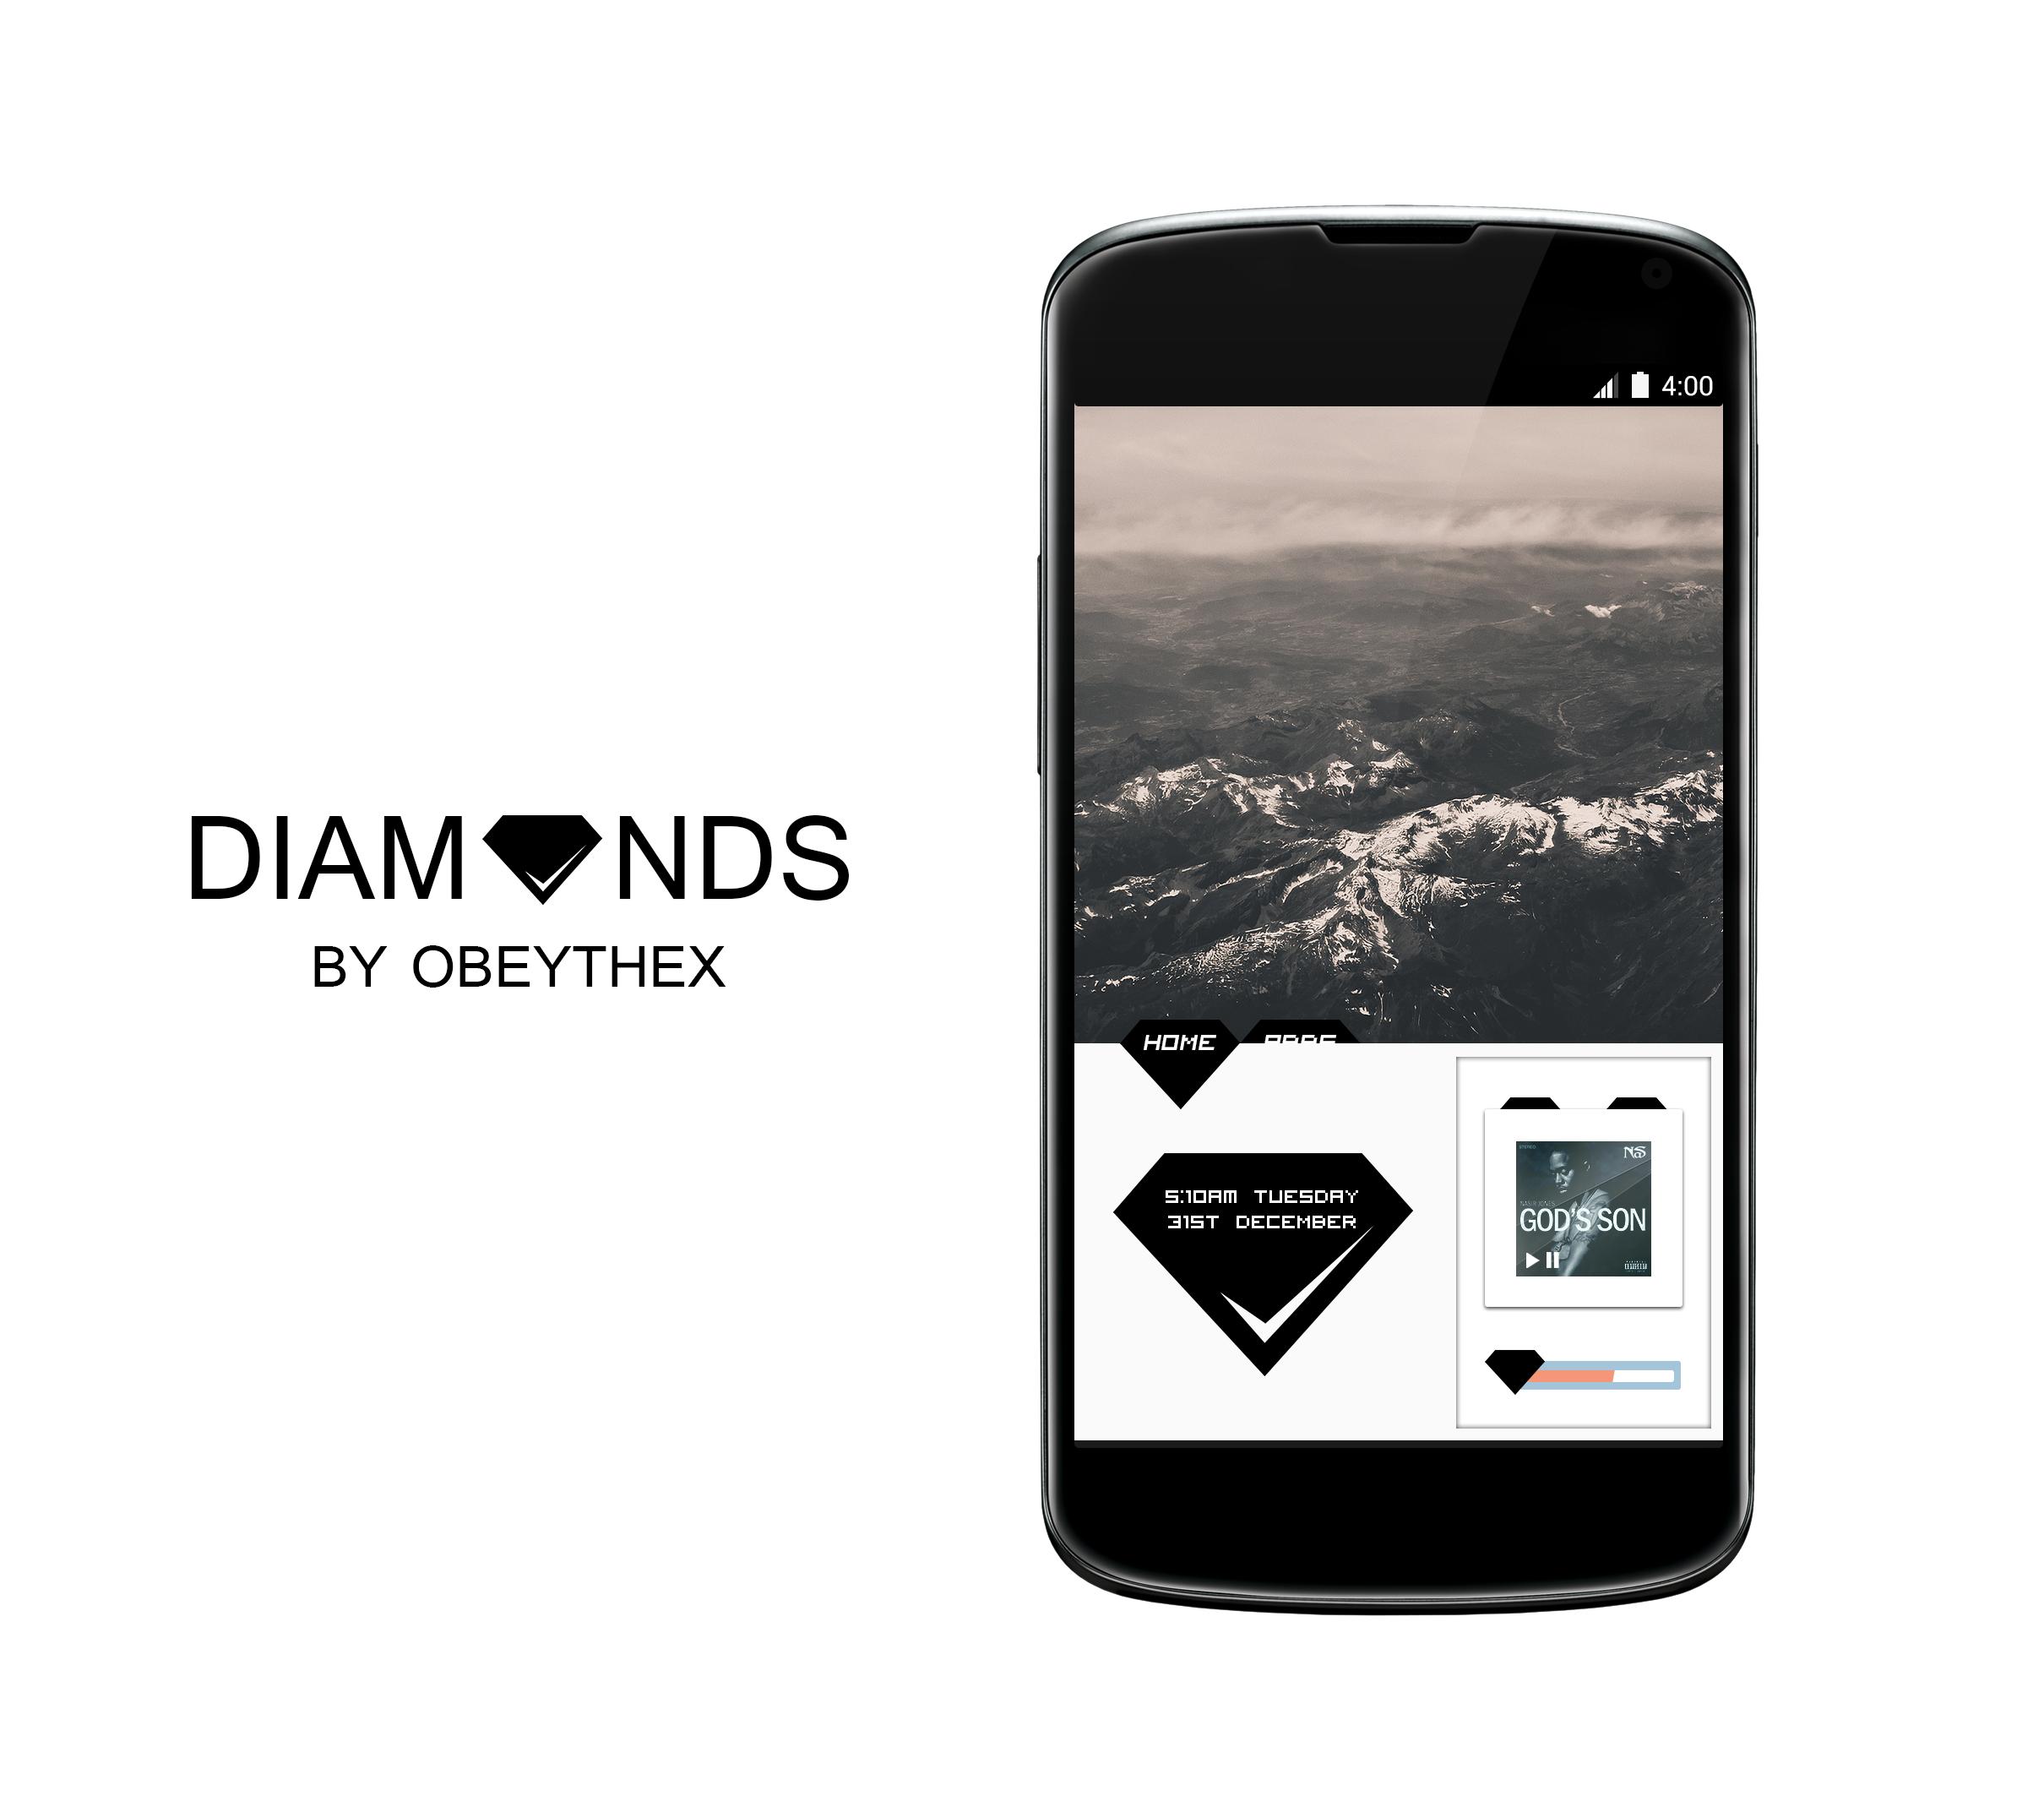 Diamond's by Obeythe10